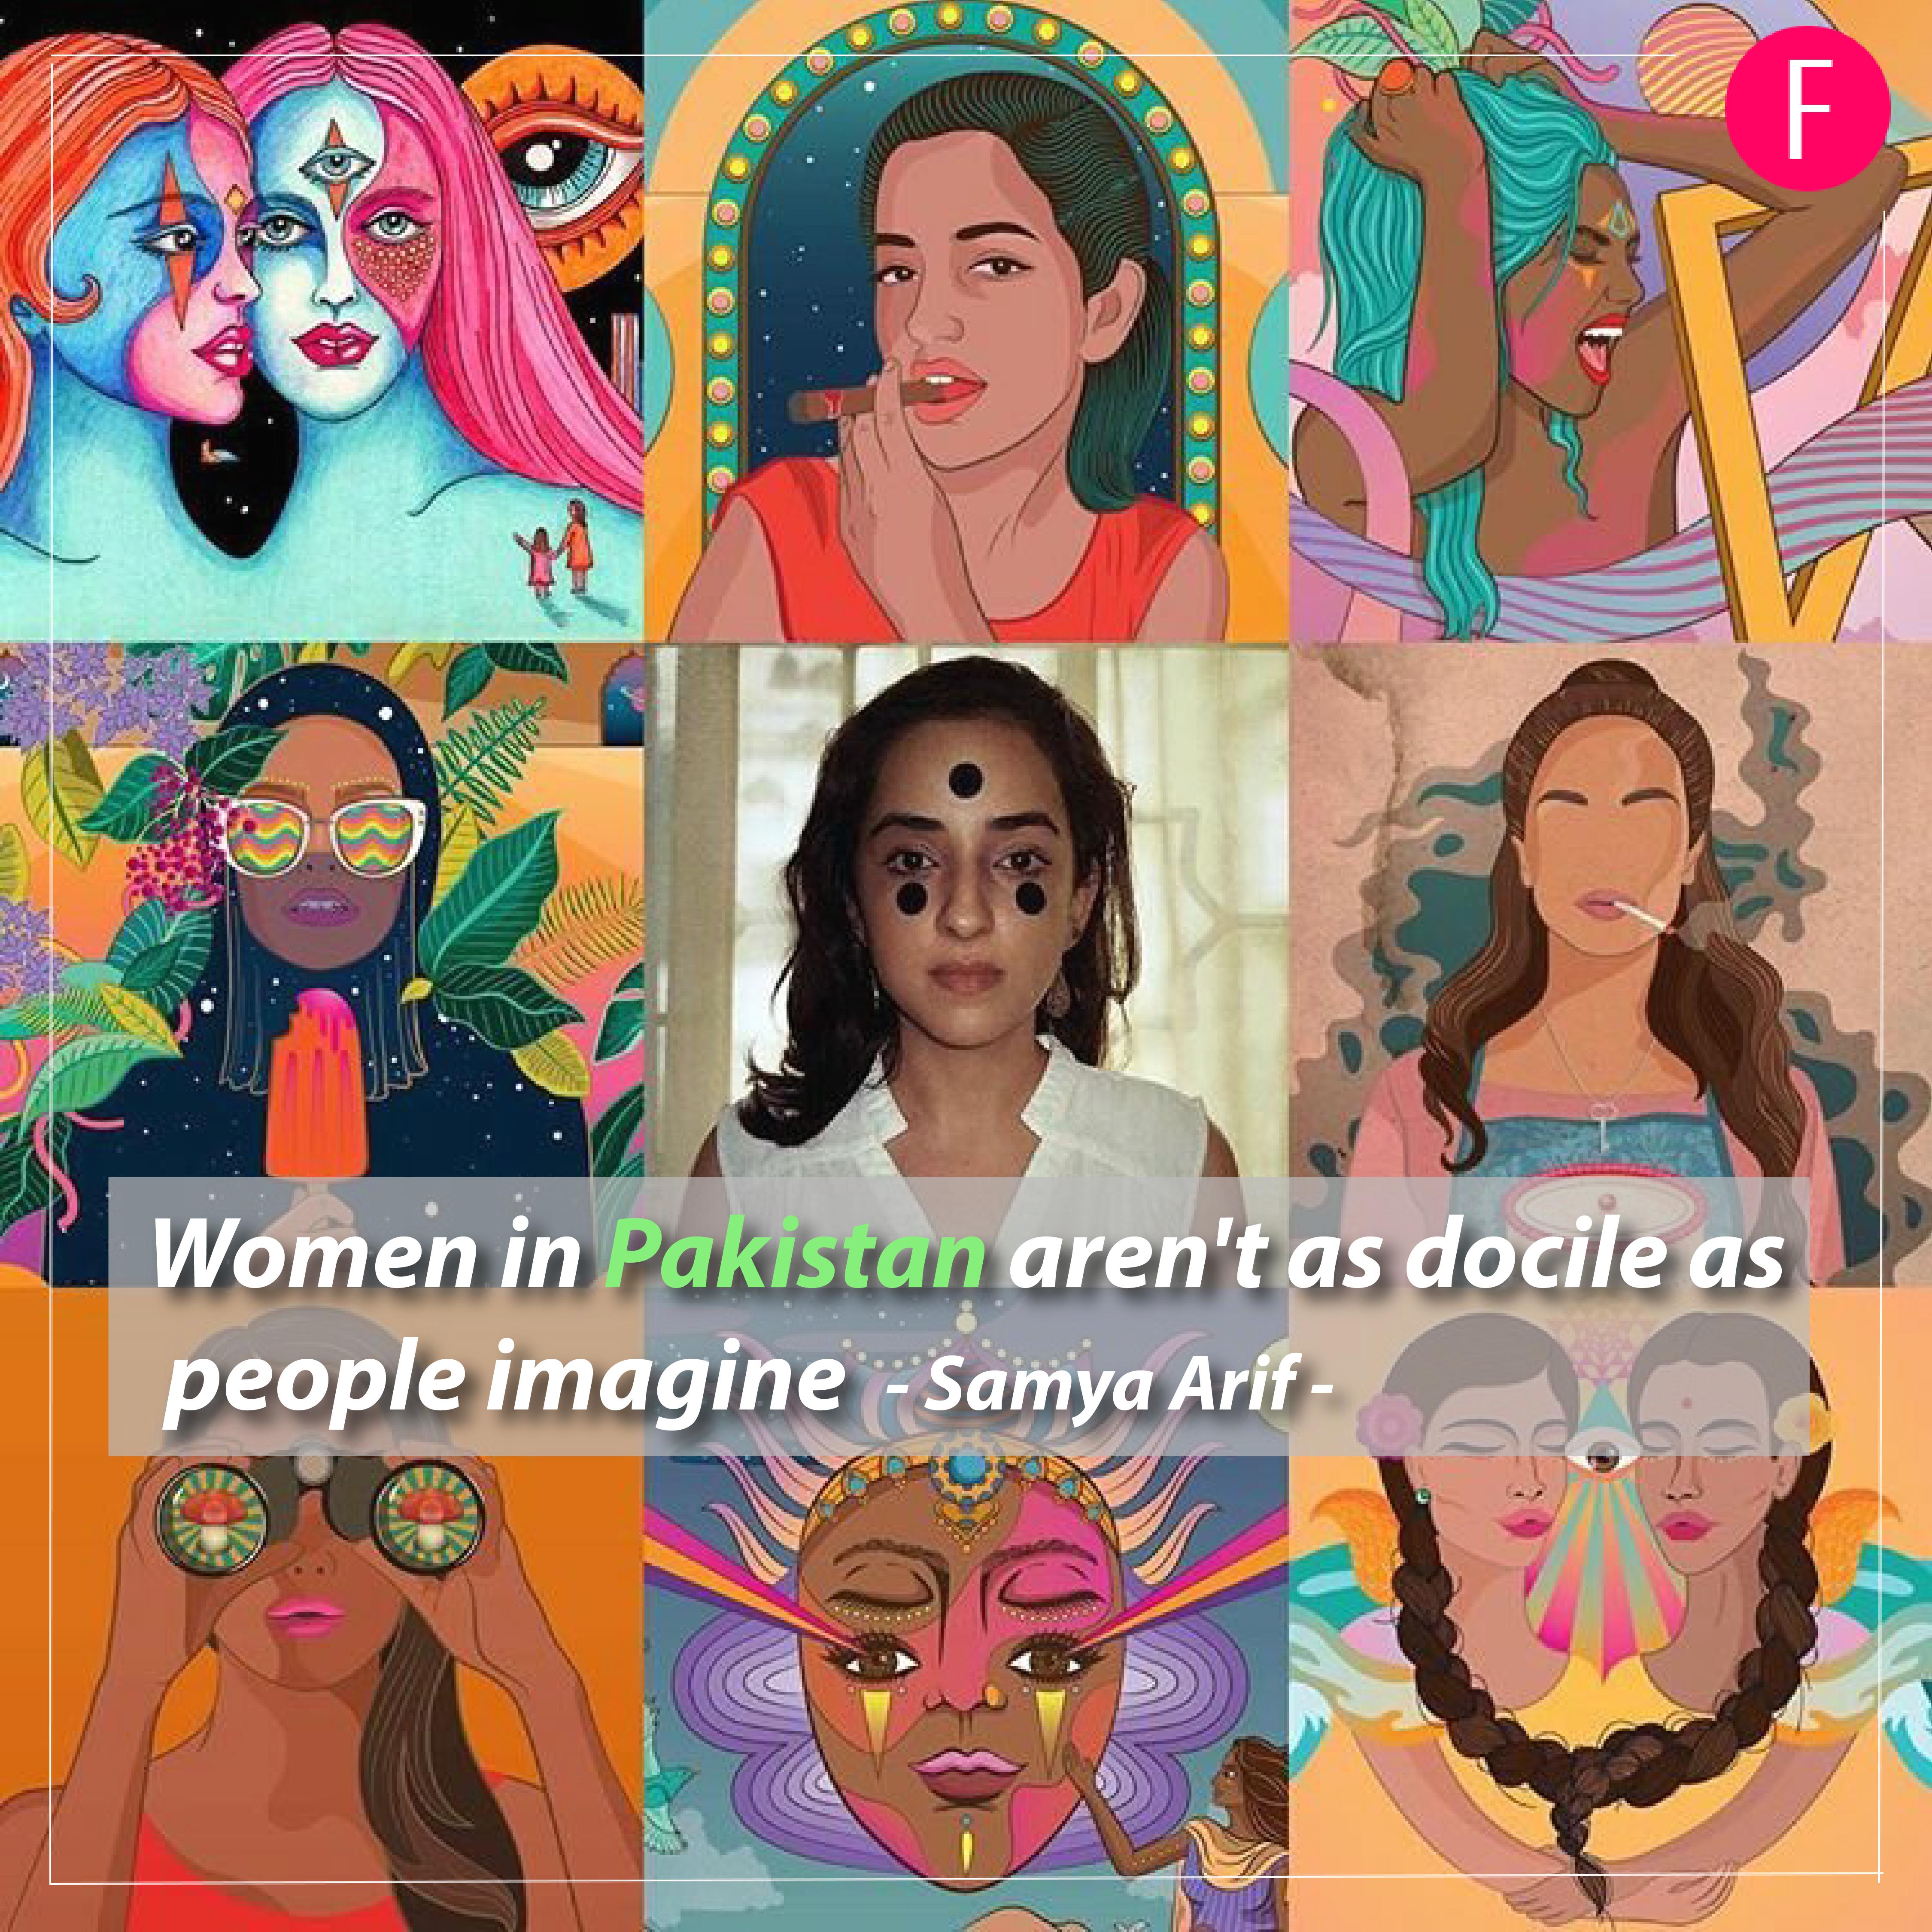 Samya Arif, Graphic designer, Pakistani illustrator